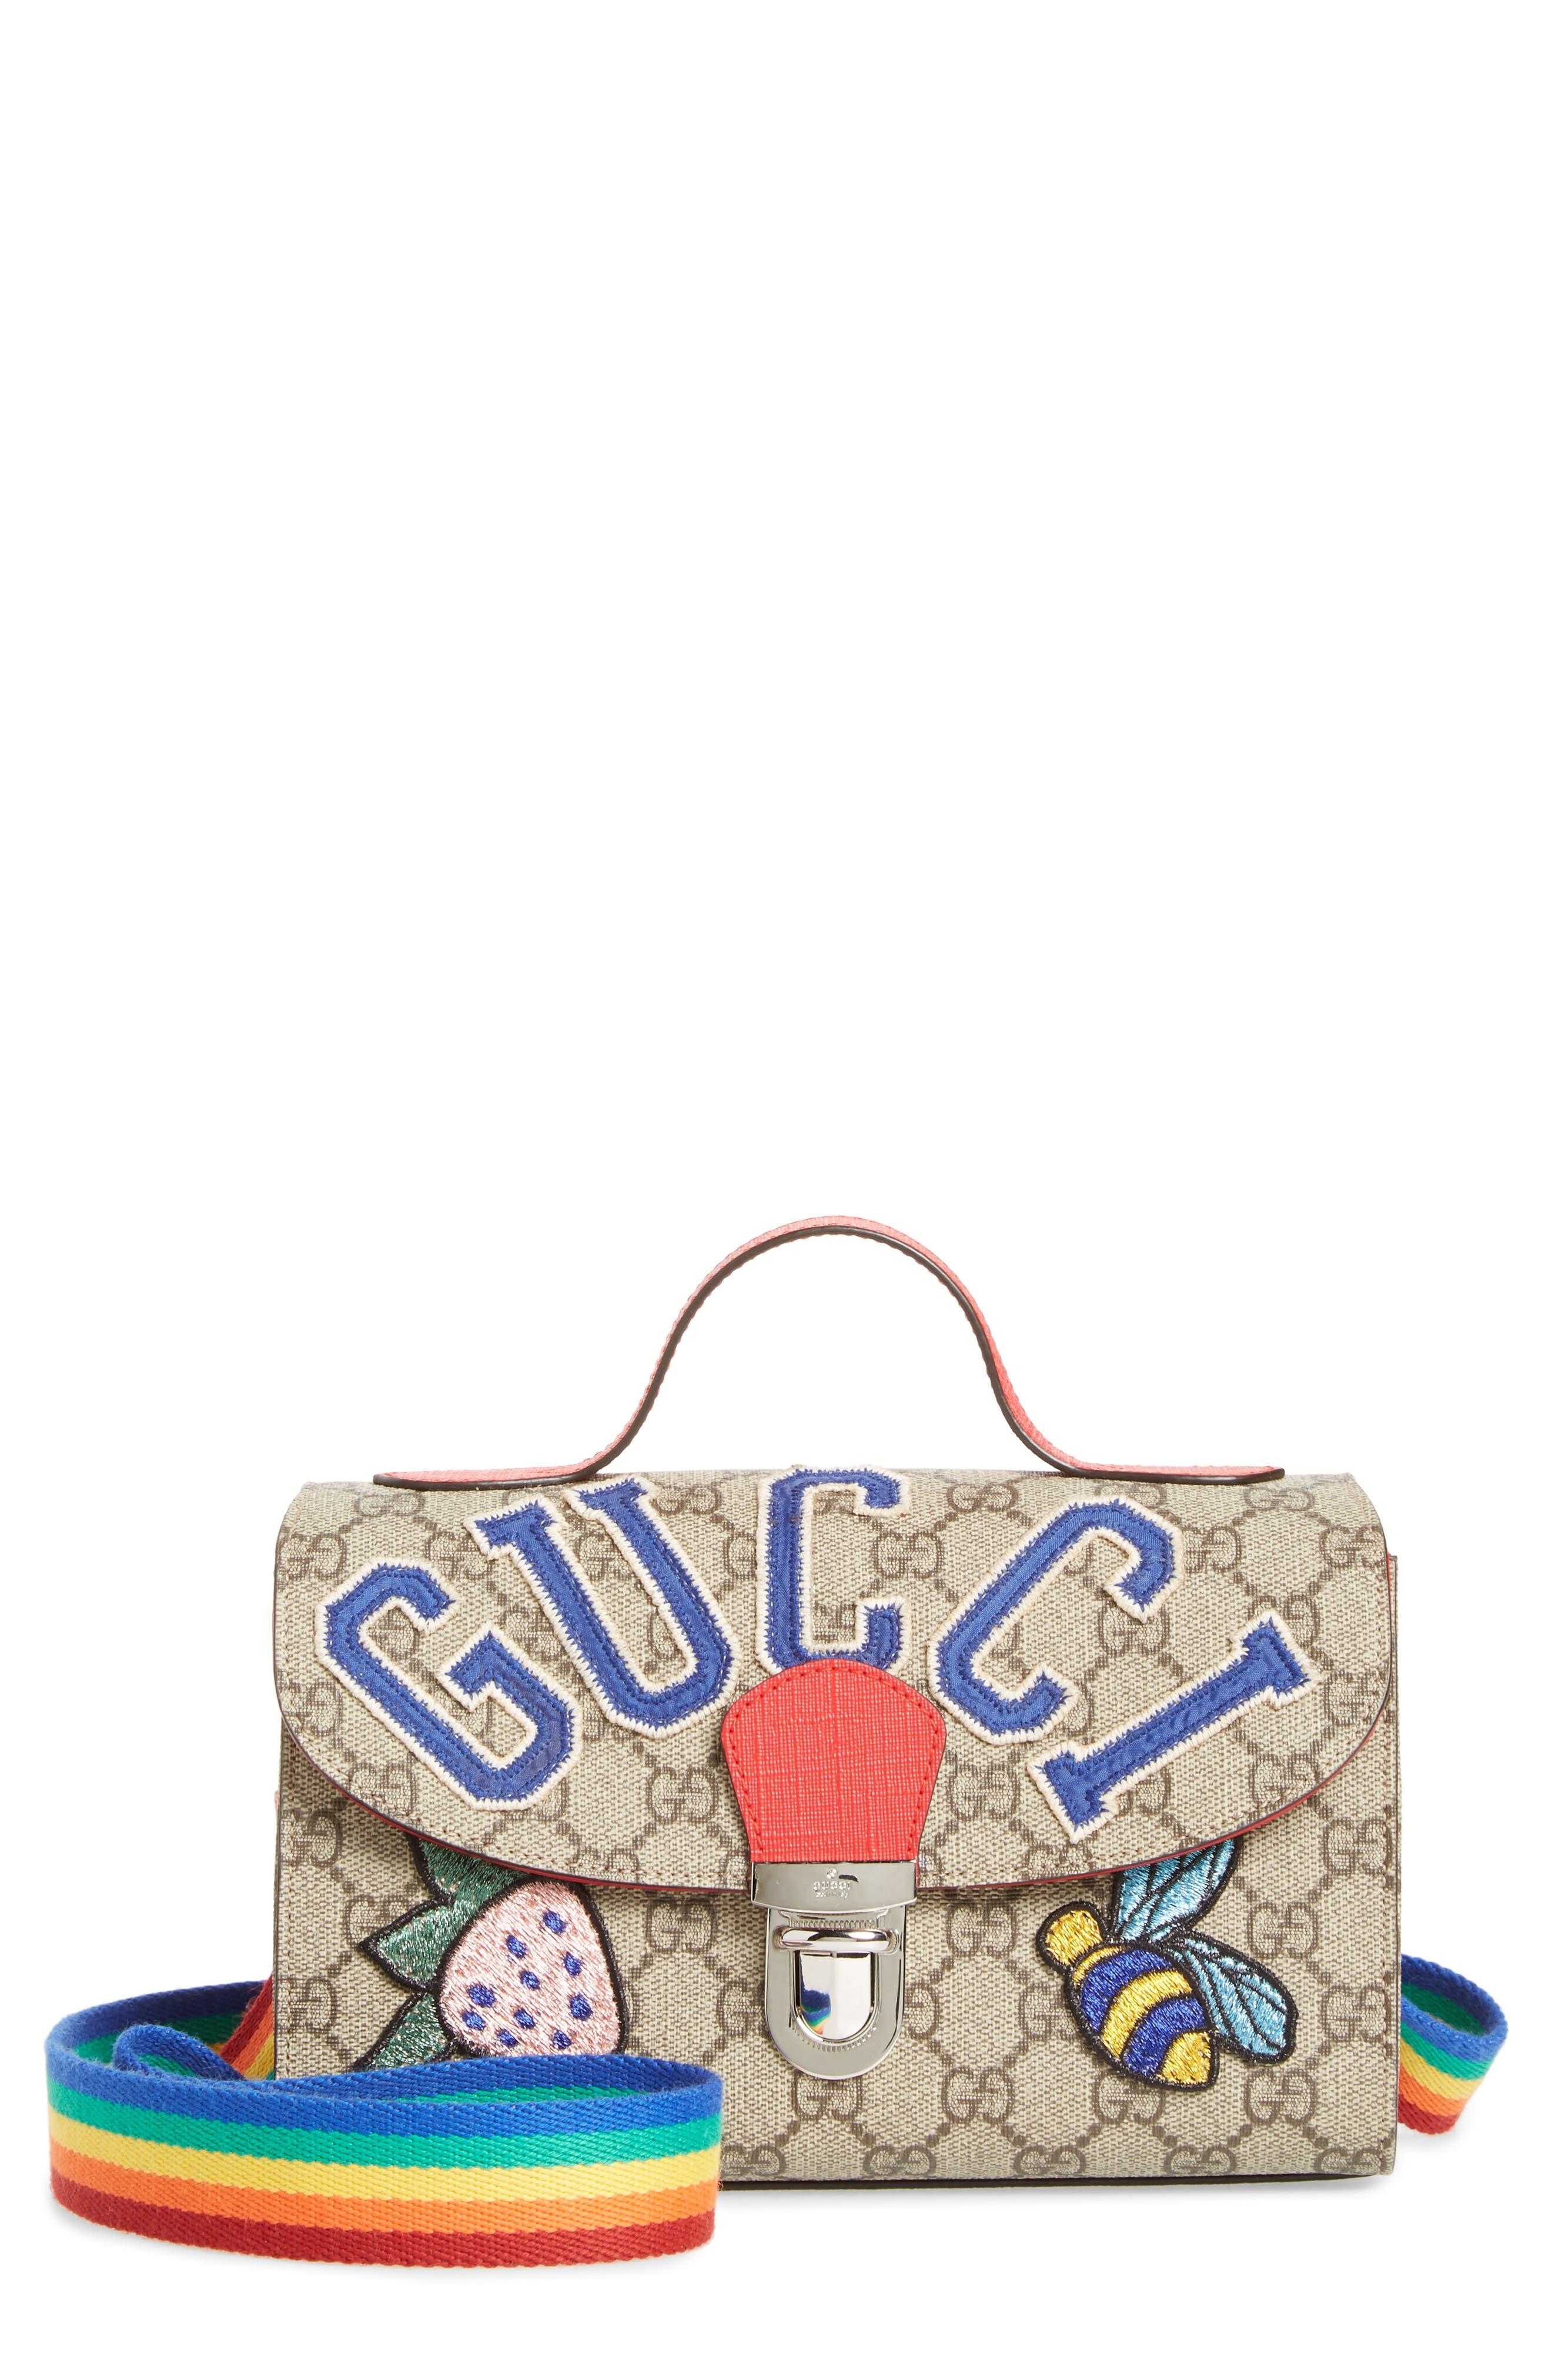 39df849de2a Girl s Gucci Junior Gg Supreme Canvas Top Handle Bag - Beige